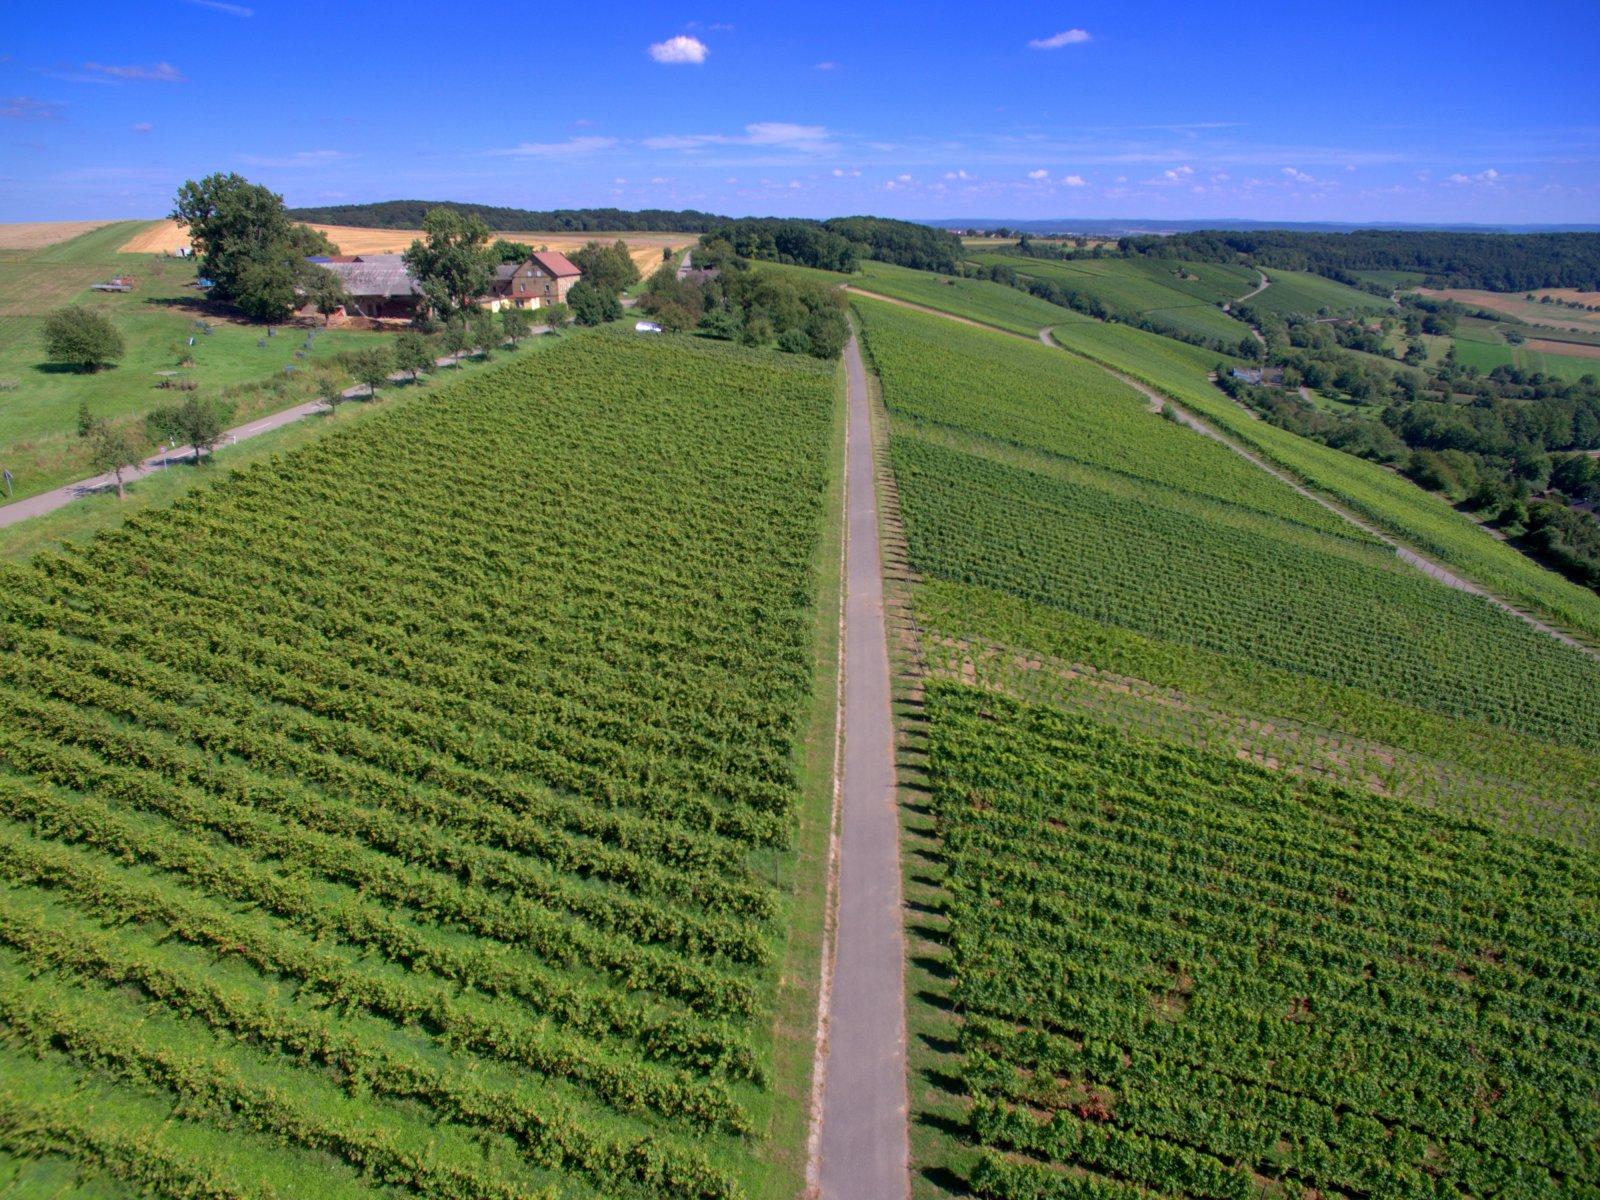 Foto aèria de vinyes